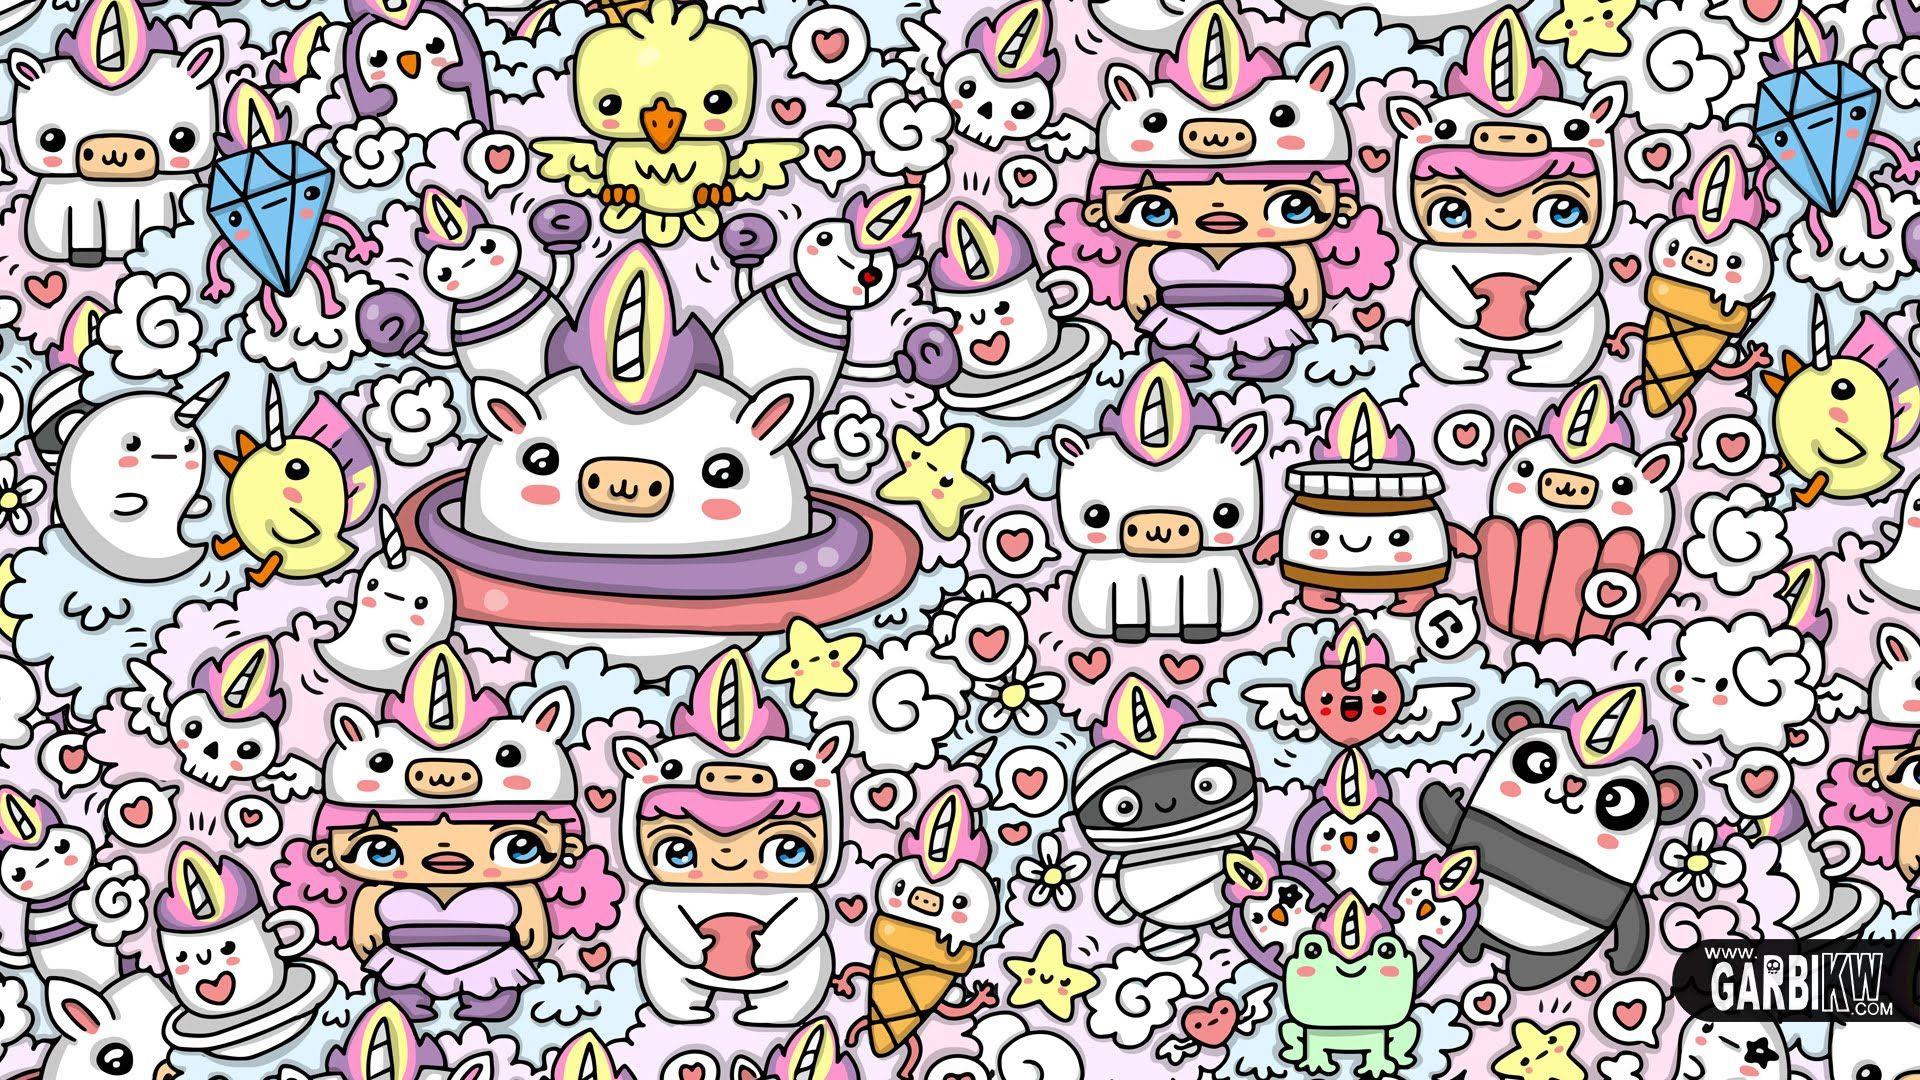 Kawaii Unicorn World Kawaii Graffiti And Cute Doodles By Garbi Kw Cute Doodles Unicorn Wallpaper Unicorn Wallpaper Cute